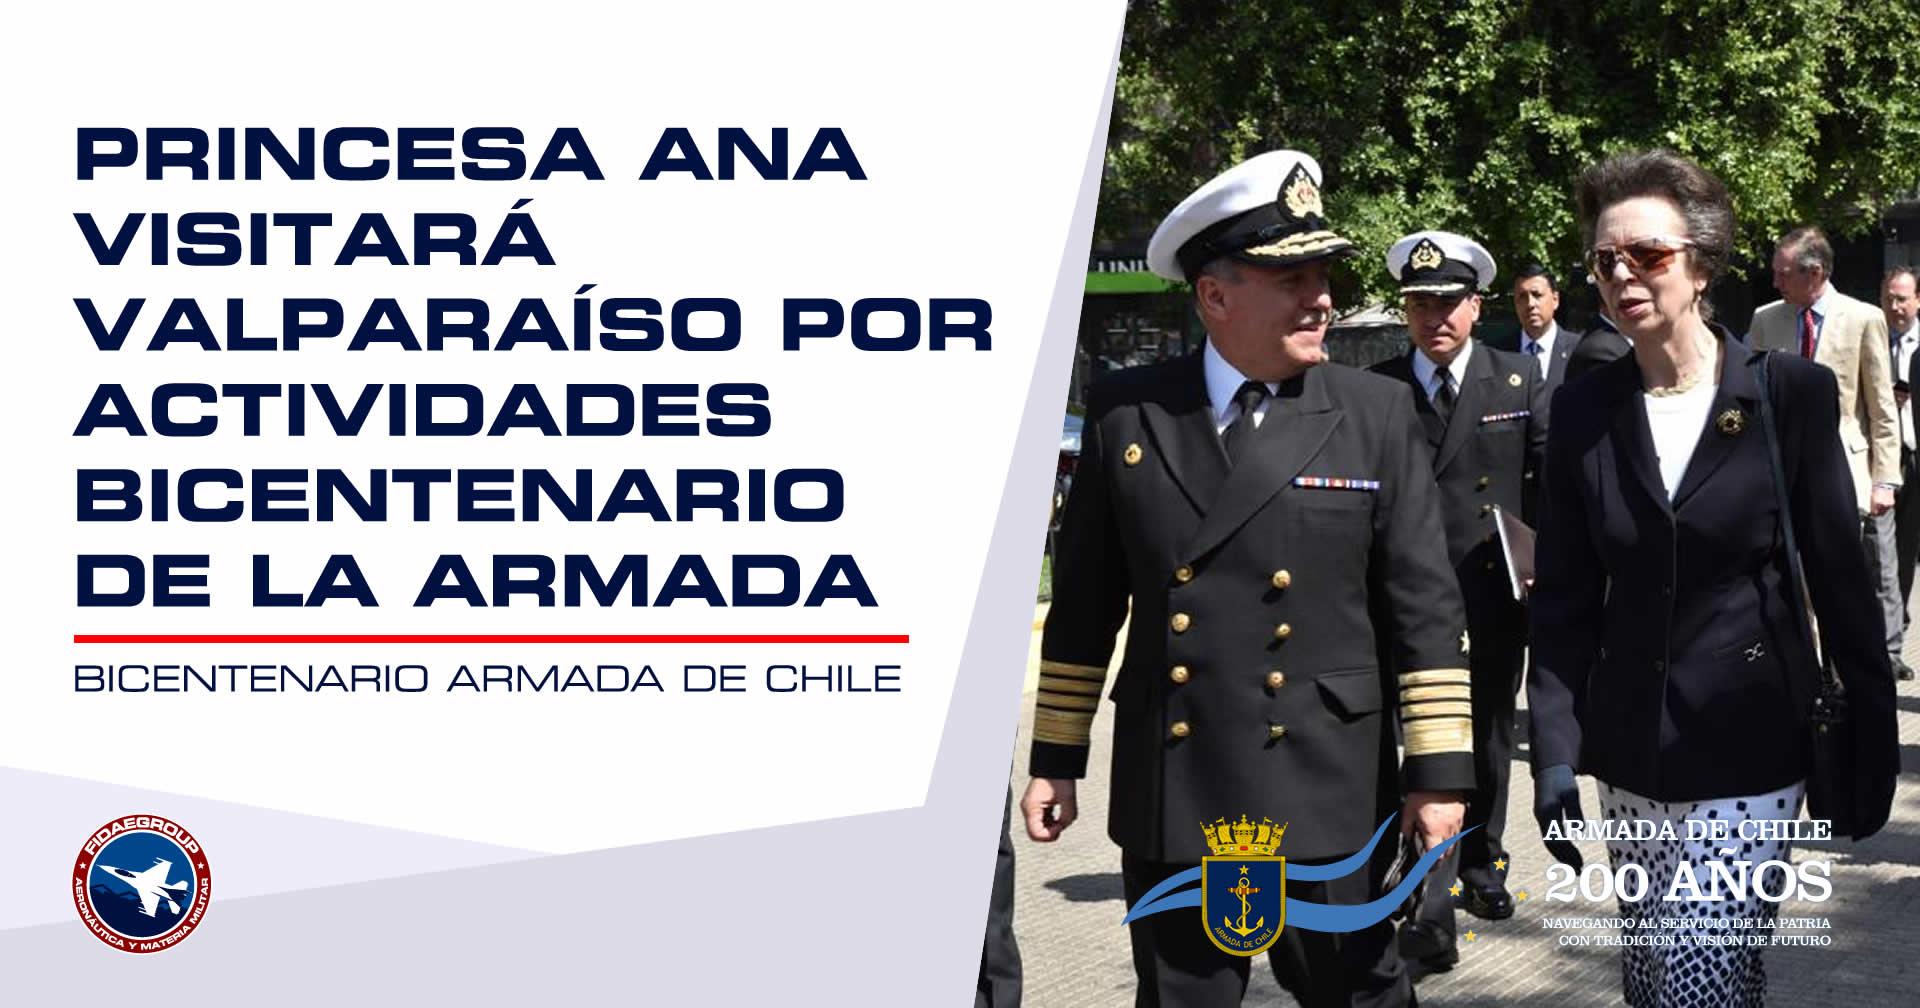 Photo of Princesa Ana visitará Valparaíso por actividades Bicentenario de la Armada